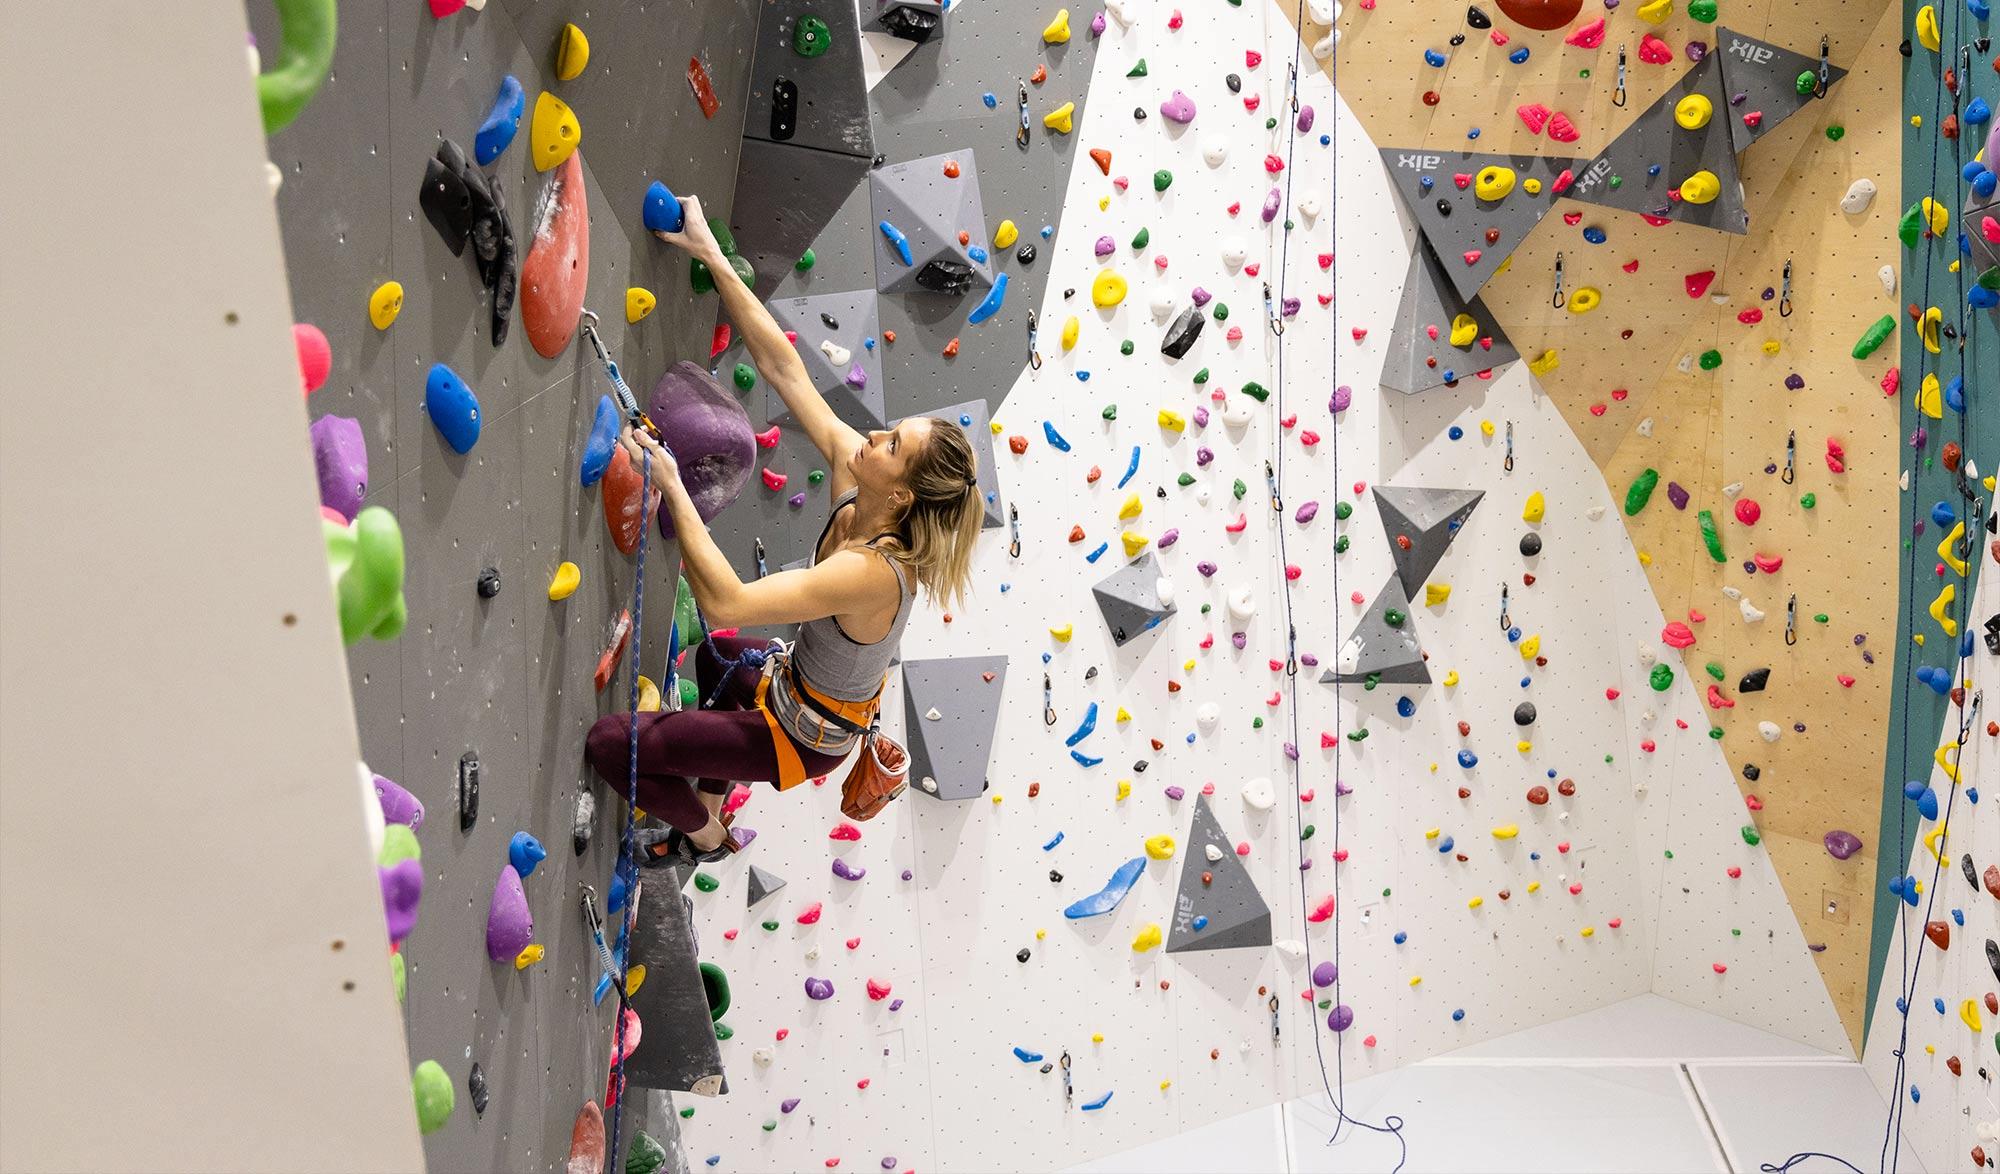 Climb Up porte d'Italie, la plus grande salle d'escalade de France